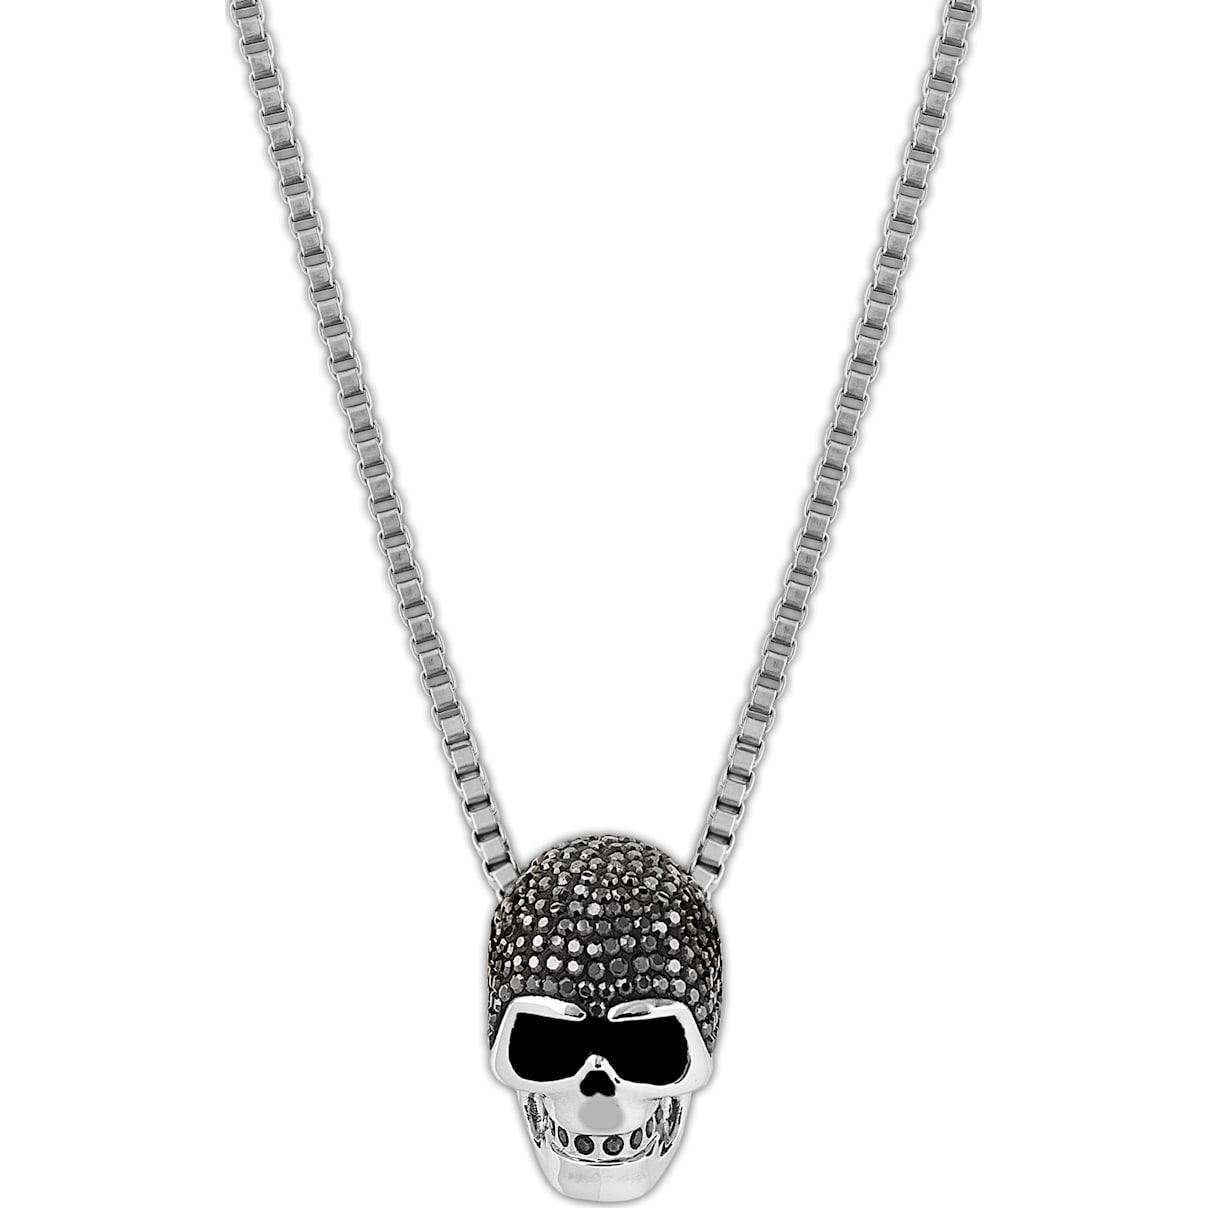 Swarovski Taddeo Skull Pendant, Black, Mixed metal finish